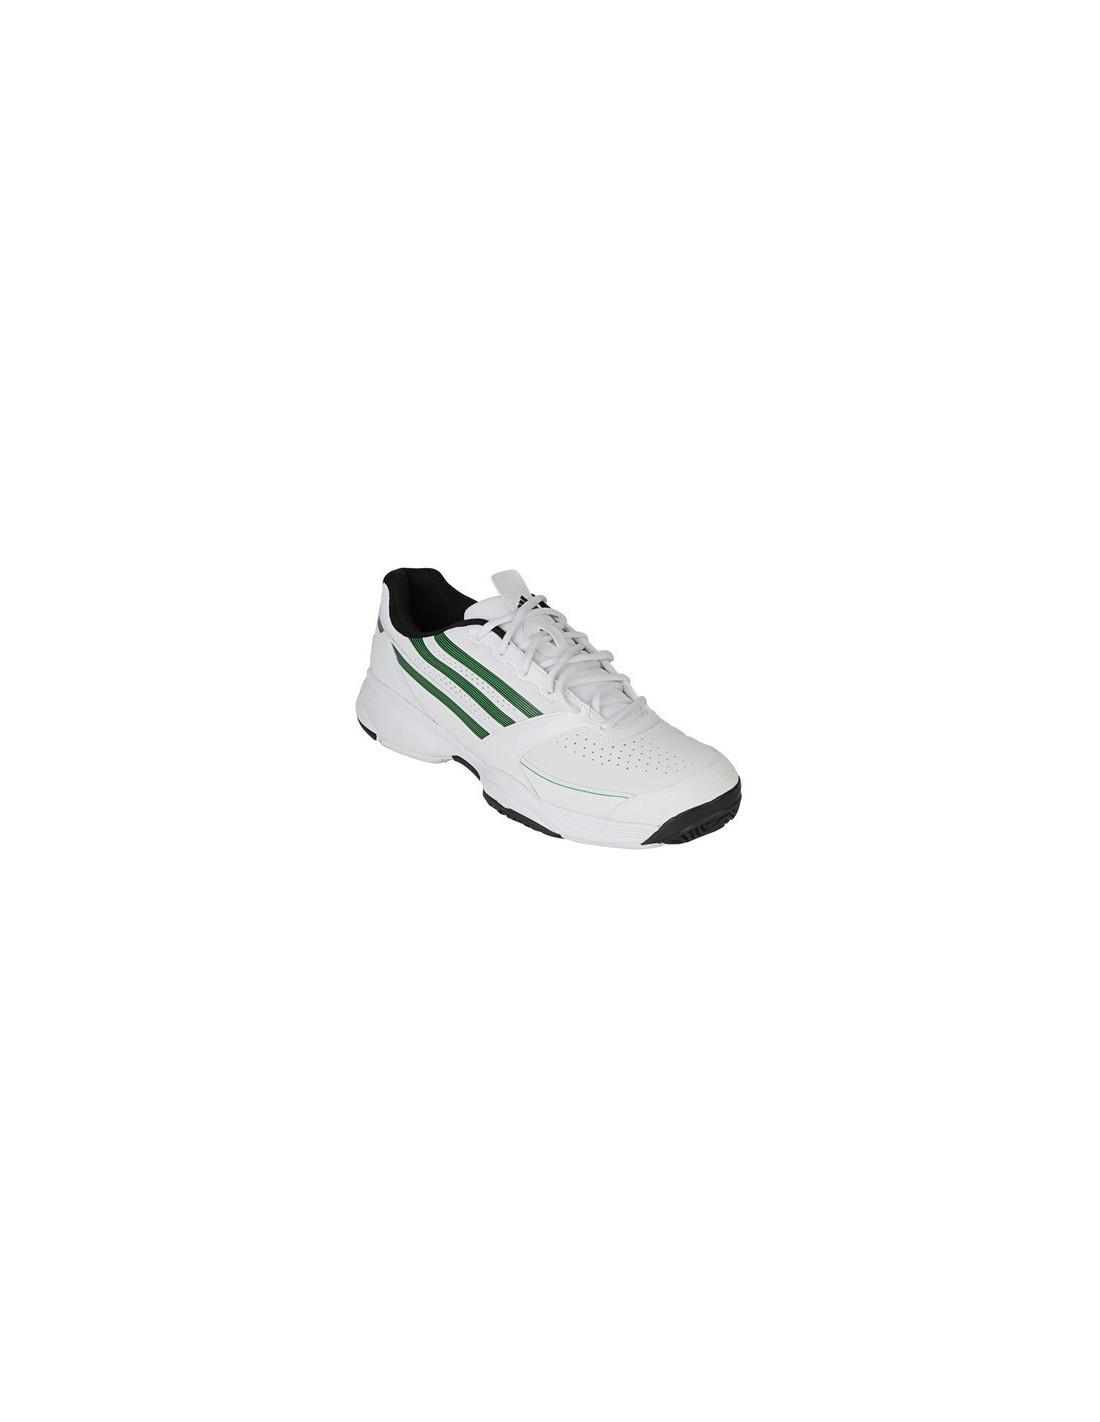 sale retailer 1f4c0 6ec21 Adidas Galaxy Elite White